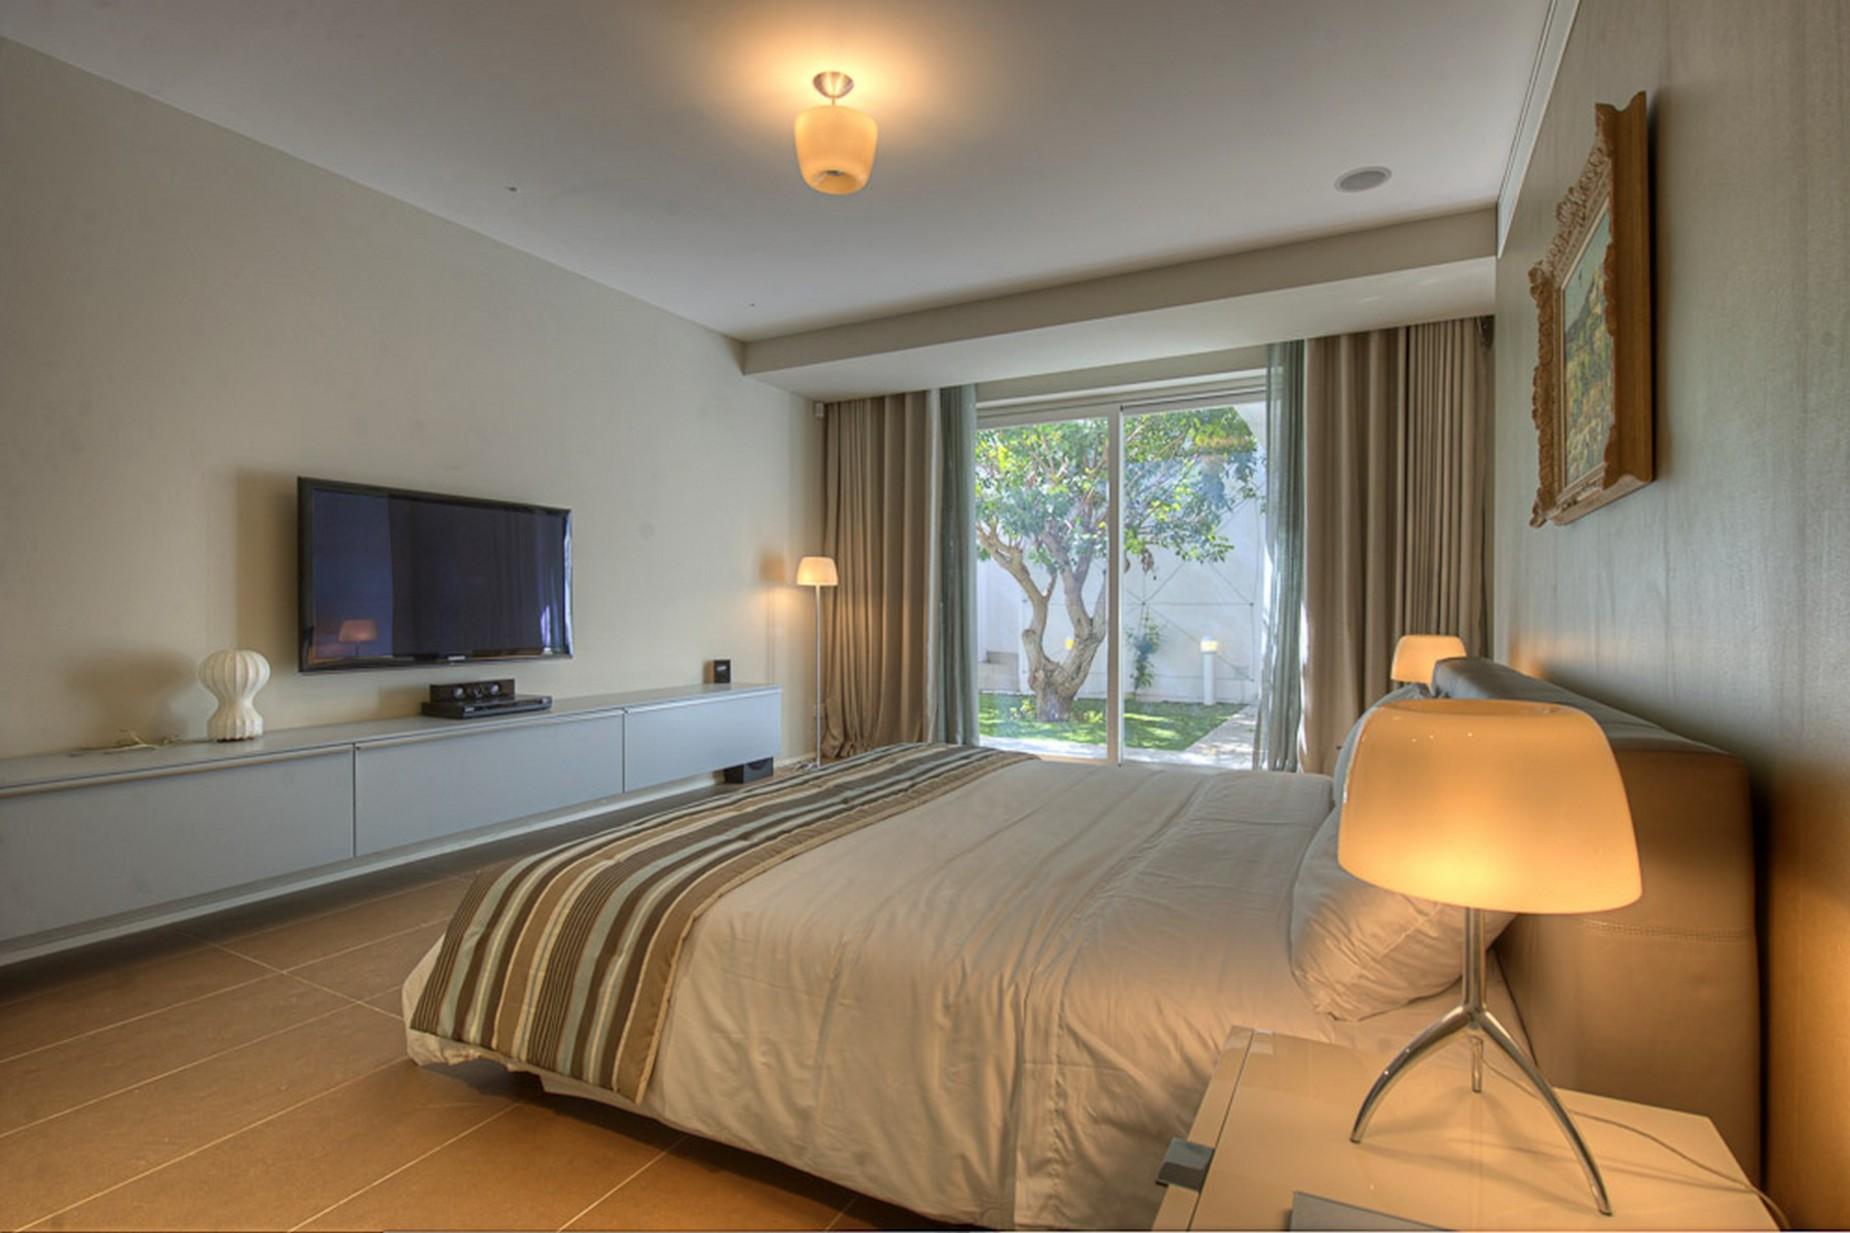 3 bed Villa For Sale in Bahar ic-Caghaq, Bahar ic-Caghaq - thumb 4